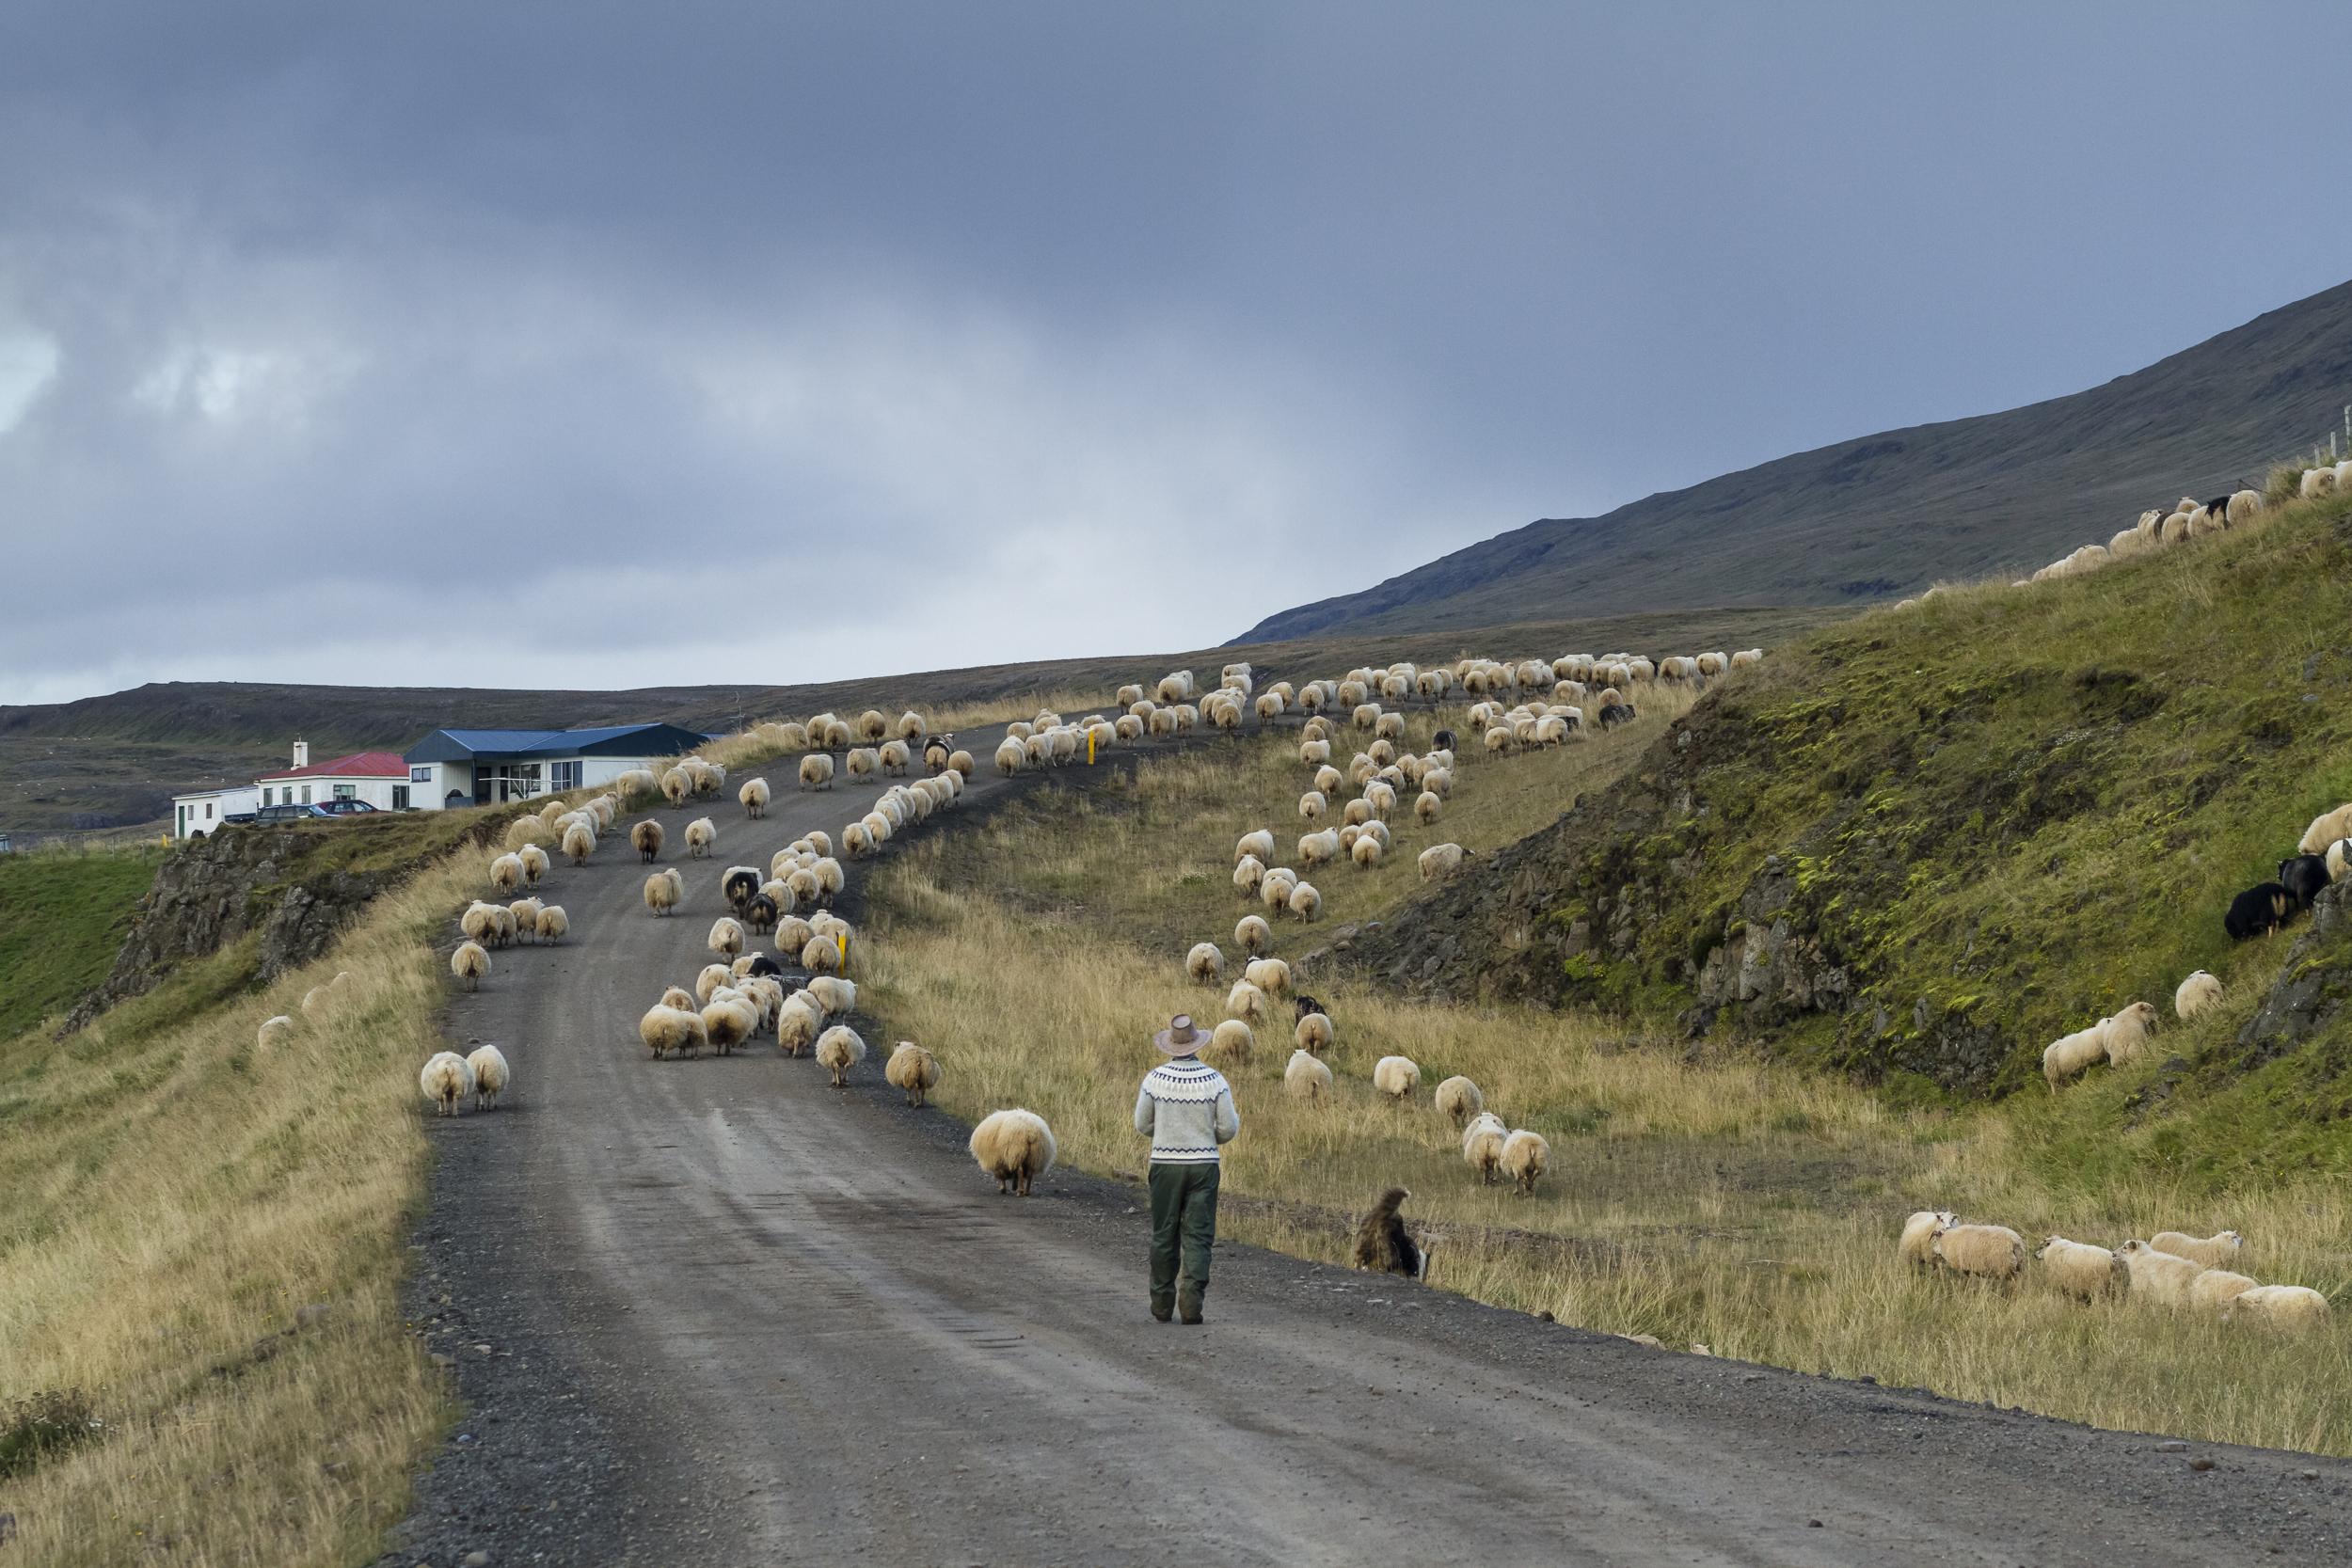 Sheep_002